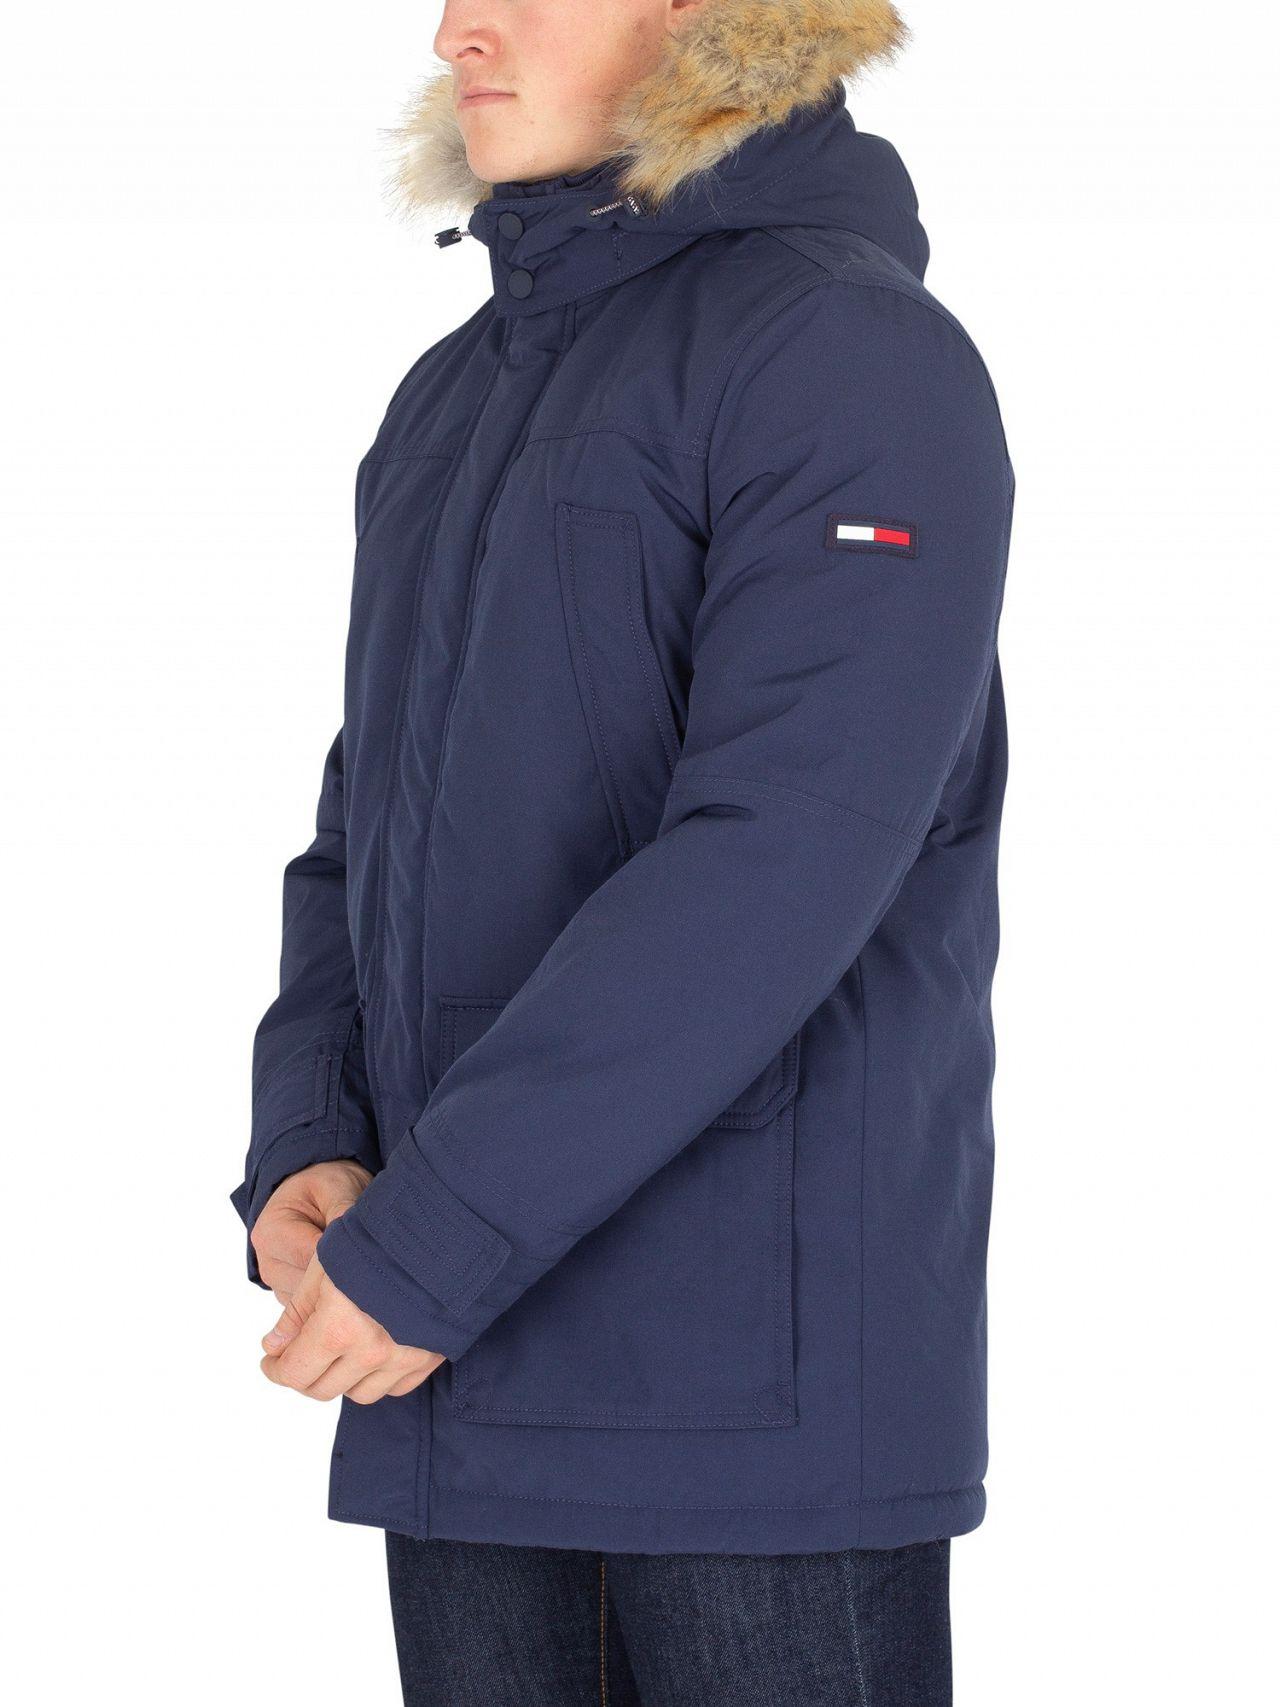 eaf25c4a Tommy Jeans Black Iris Technical Parka Jacket   Standout